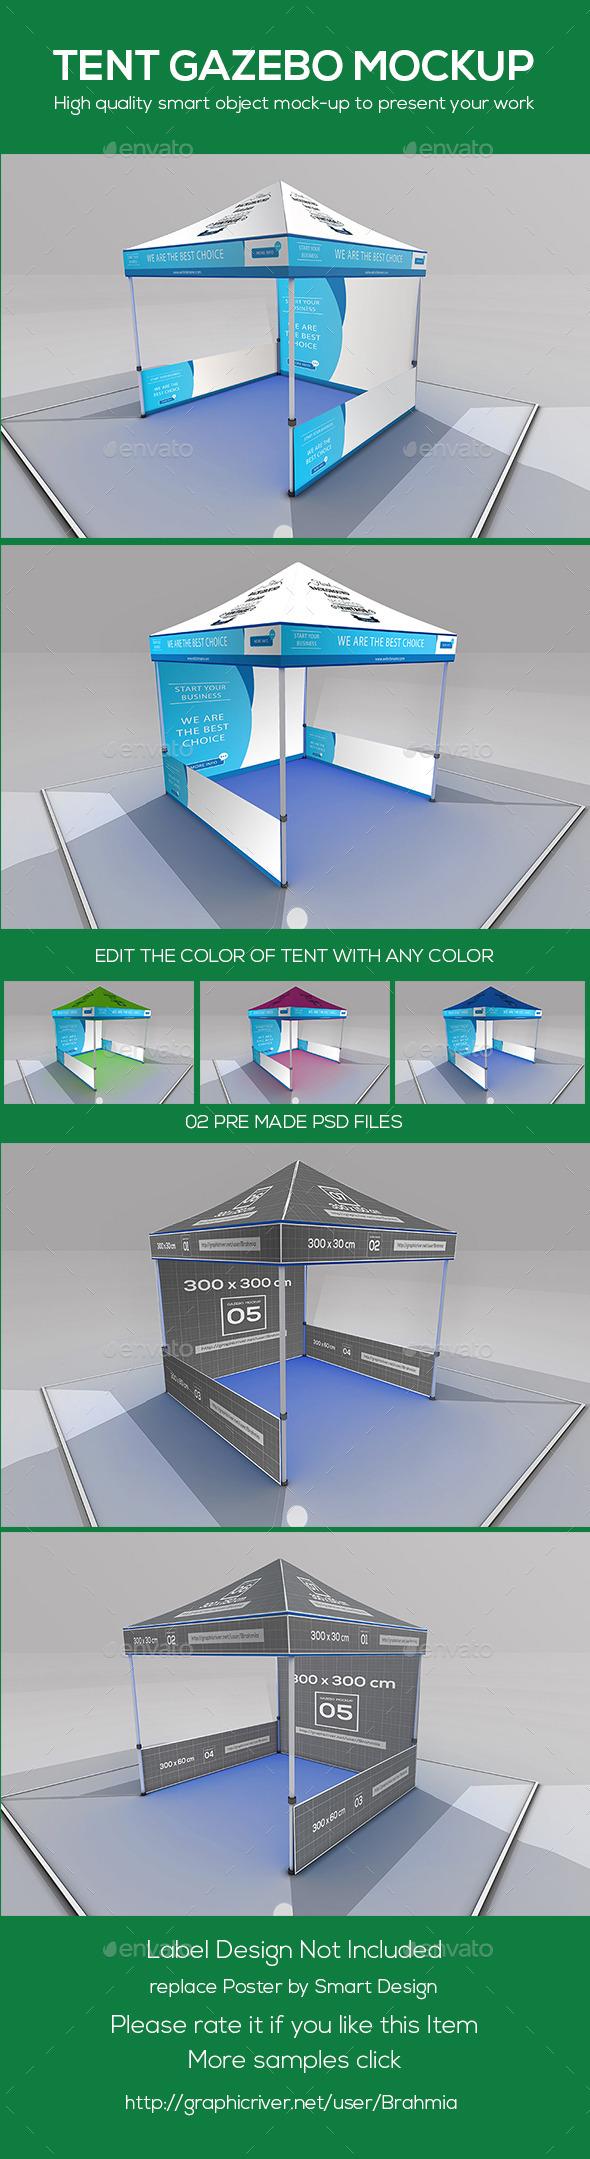 GraphicRiver Tent Gazebo Mockup 9680377